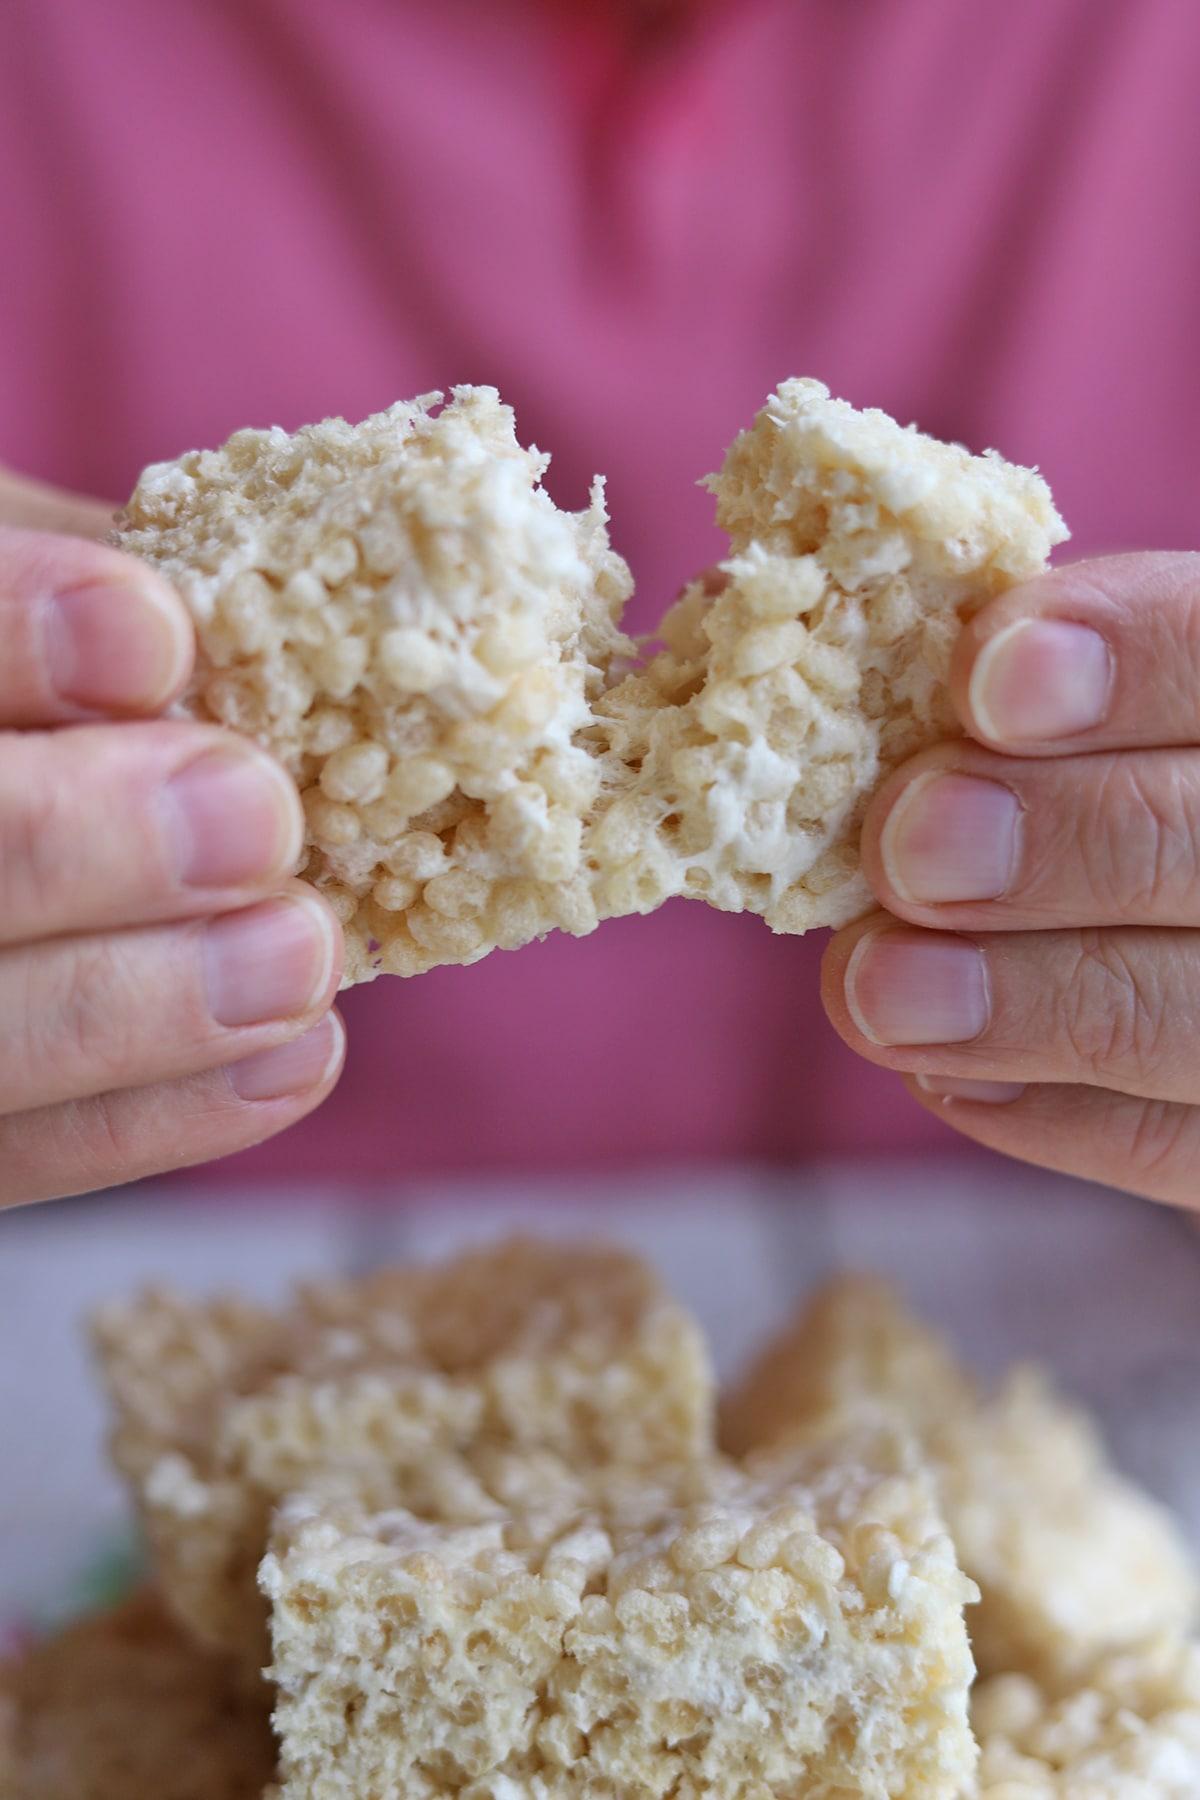 Hands pulling apart vegan rice krispie treat.